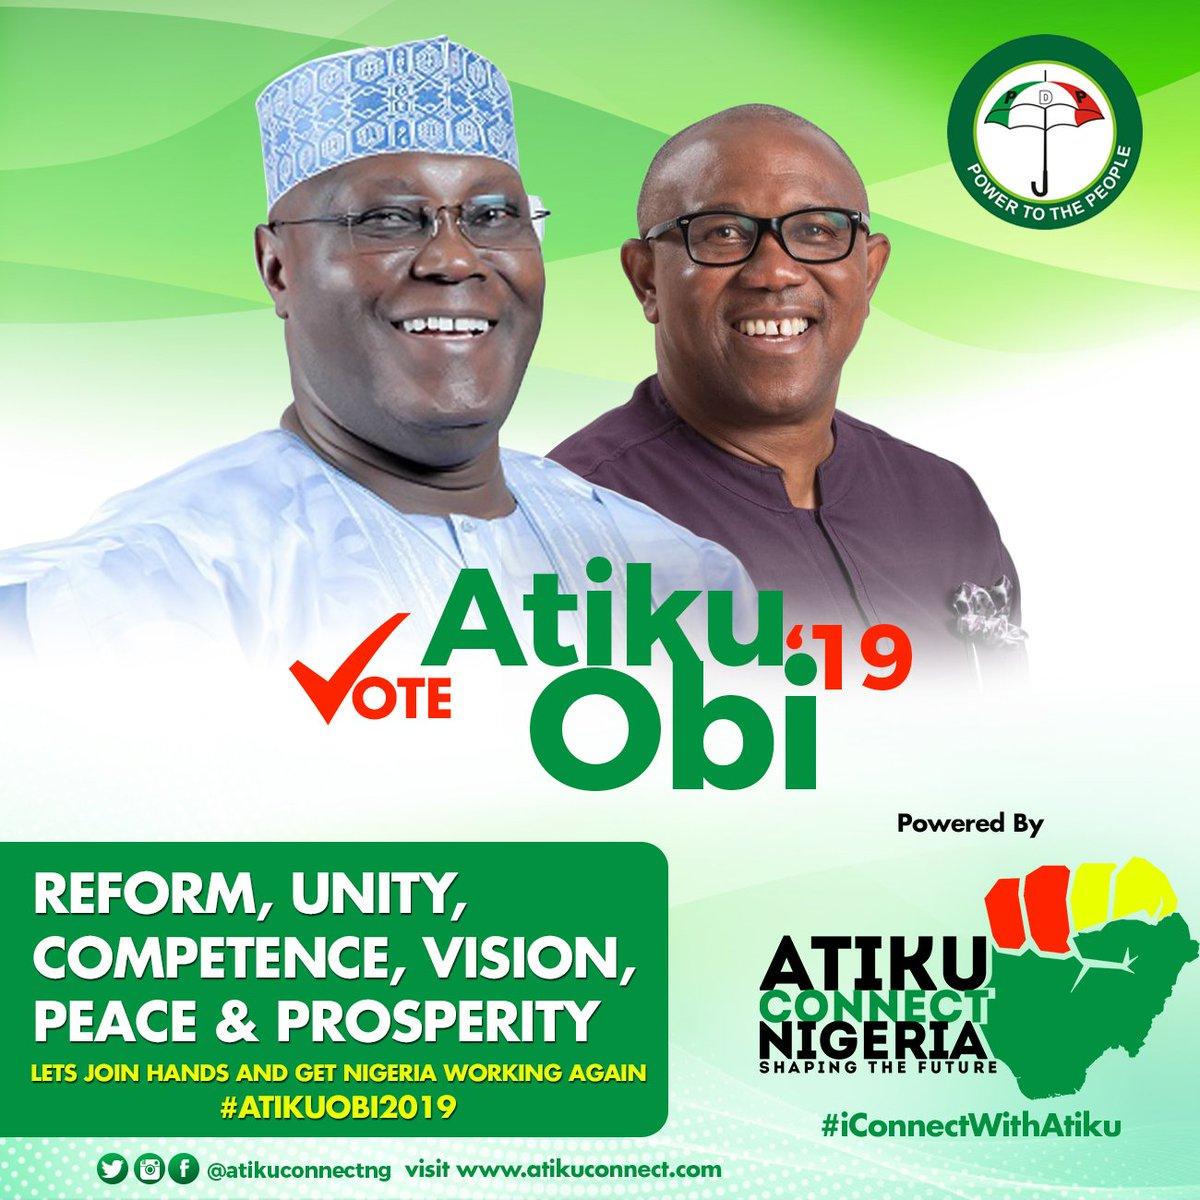 You can download a copy of The Atiku Plan to Get Nigeria Working Again via the link below  http://www. atikuconnect.com    #atiku-plan  Together We can shape the future #AtikuConnect #iConnectWithAtiku #LetsGetNigeriaWorkingAgain #AtikuConnectNigeria #Atiku #AtikuObi2019 <br>http://pic.twitter.com/HyVVini08X